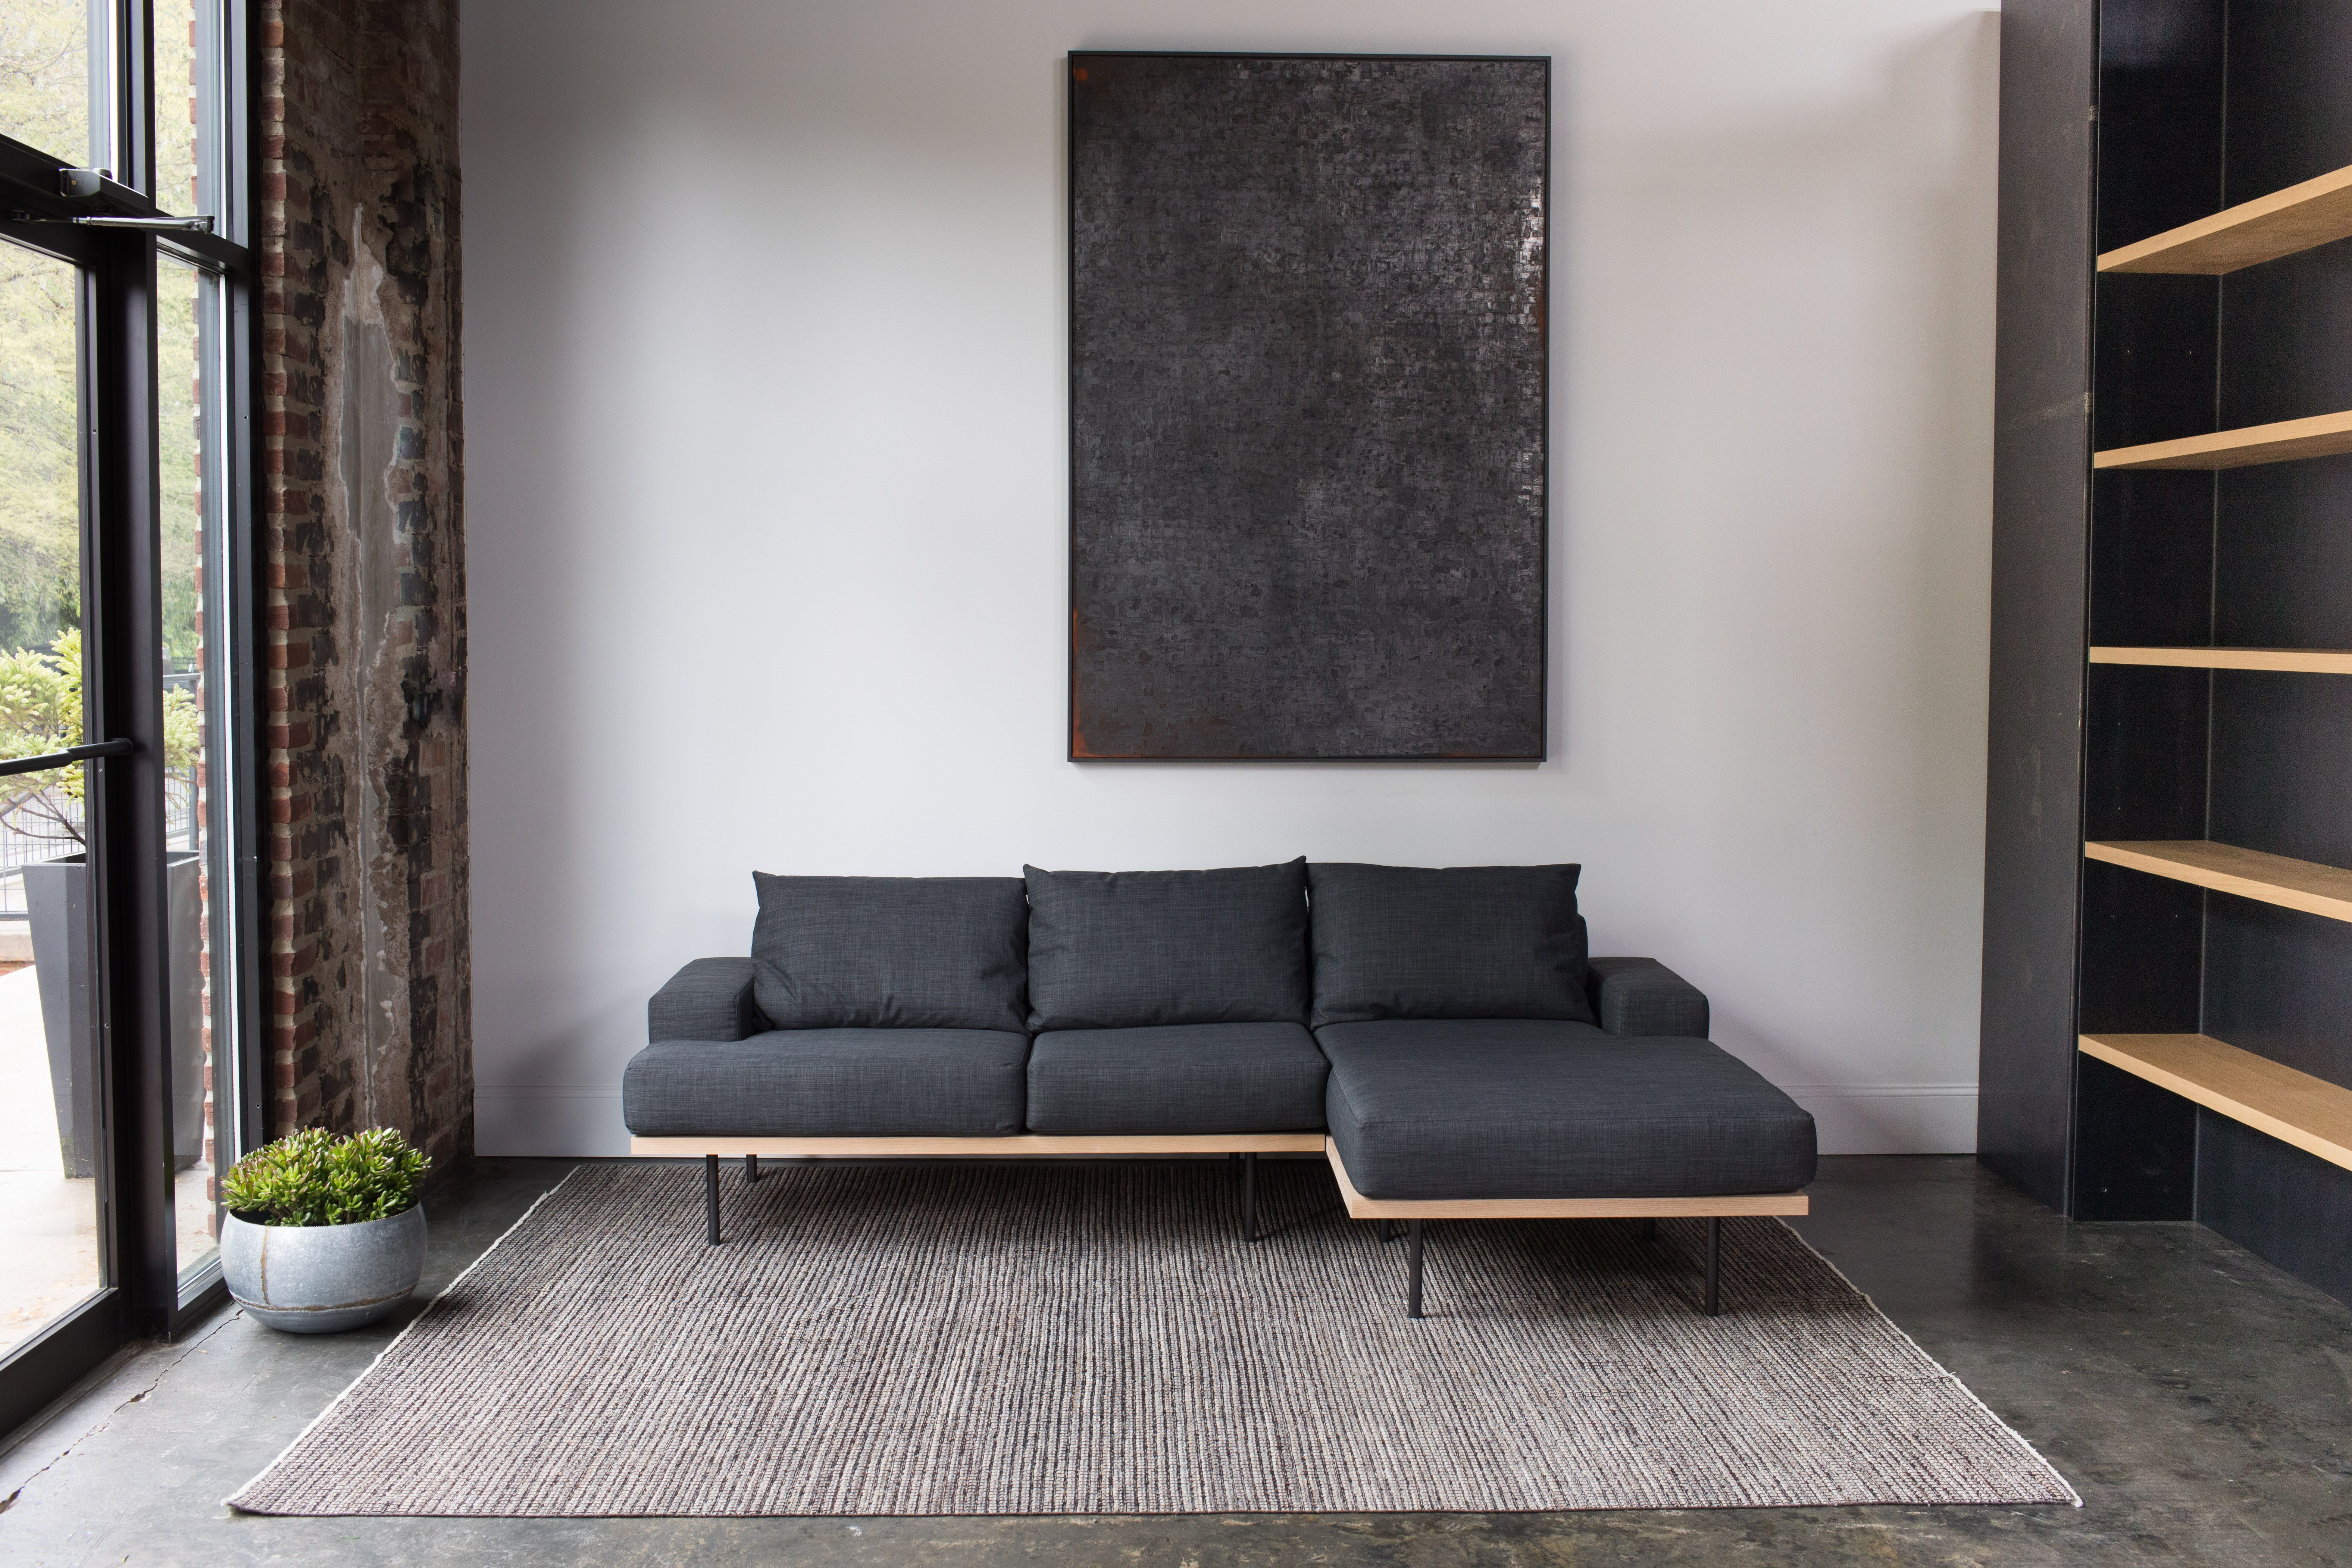 Photo of Modular Sectional Sofa